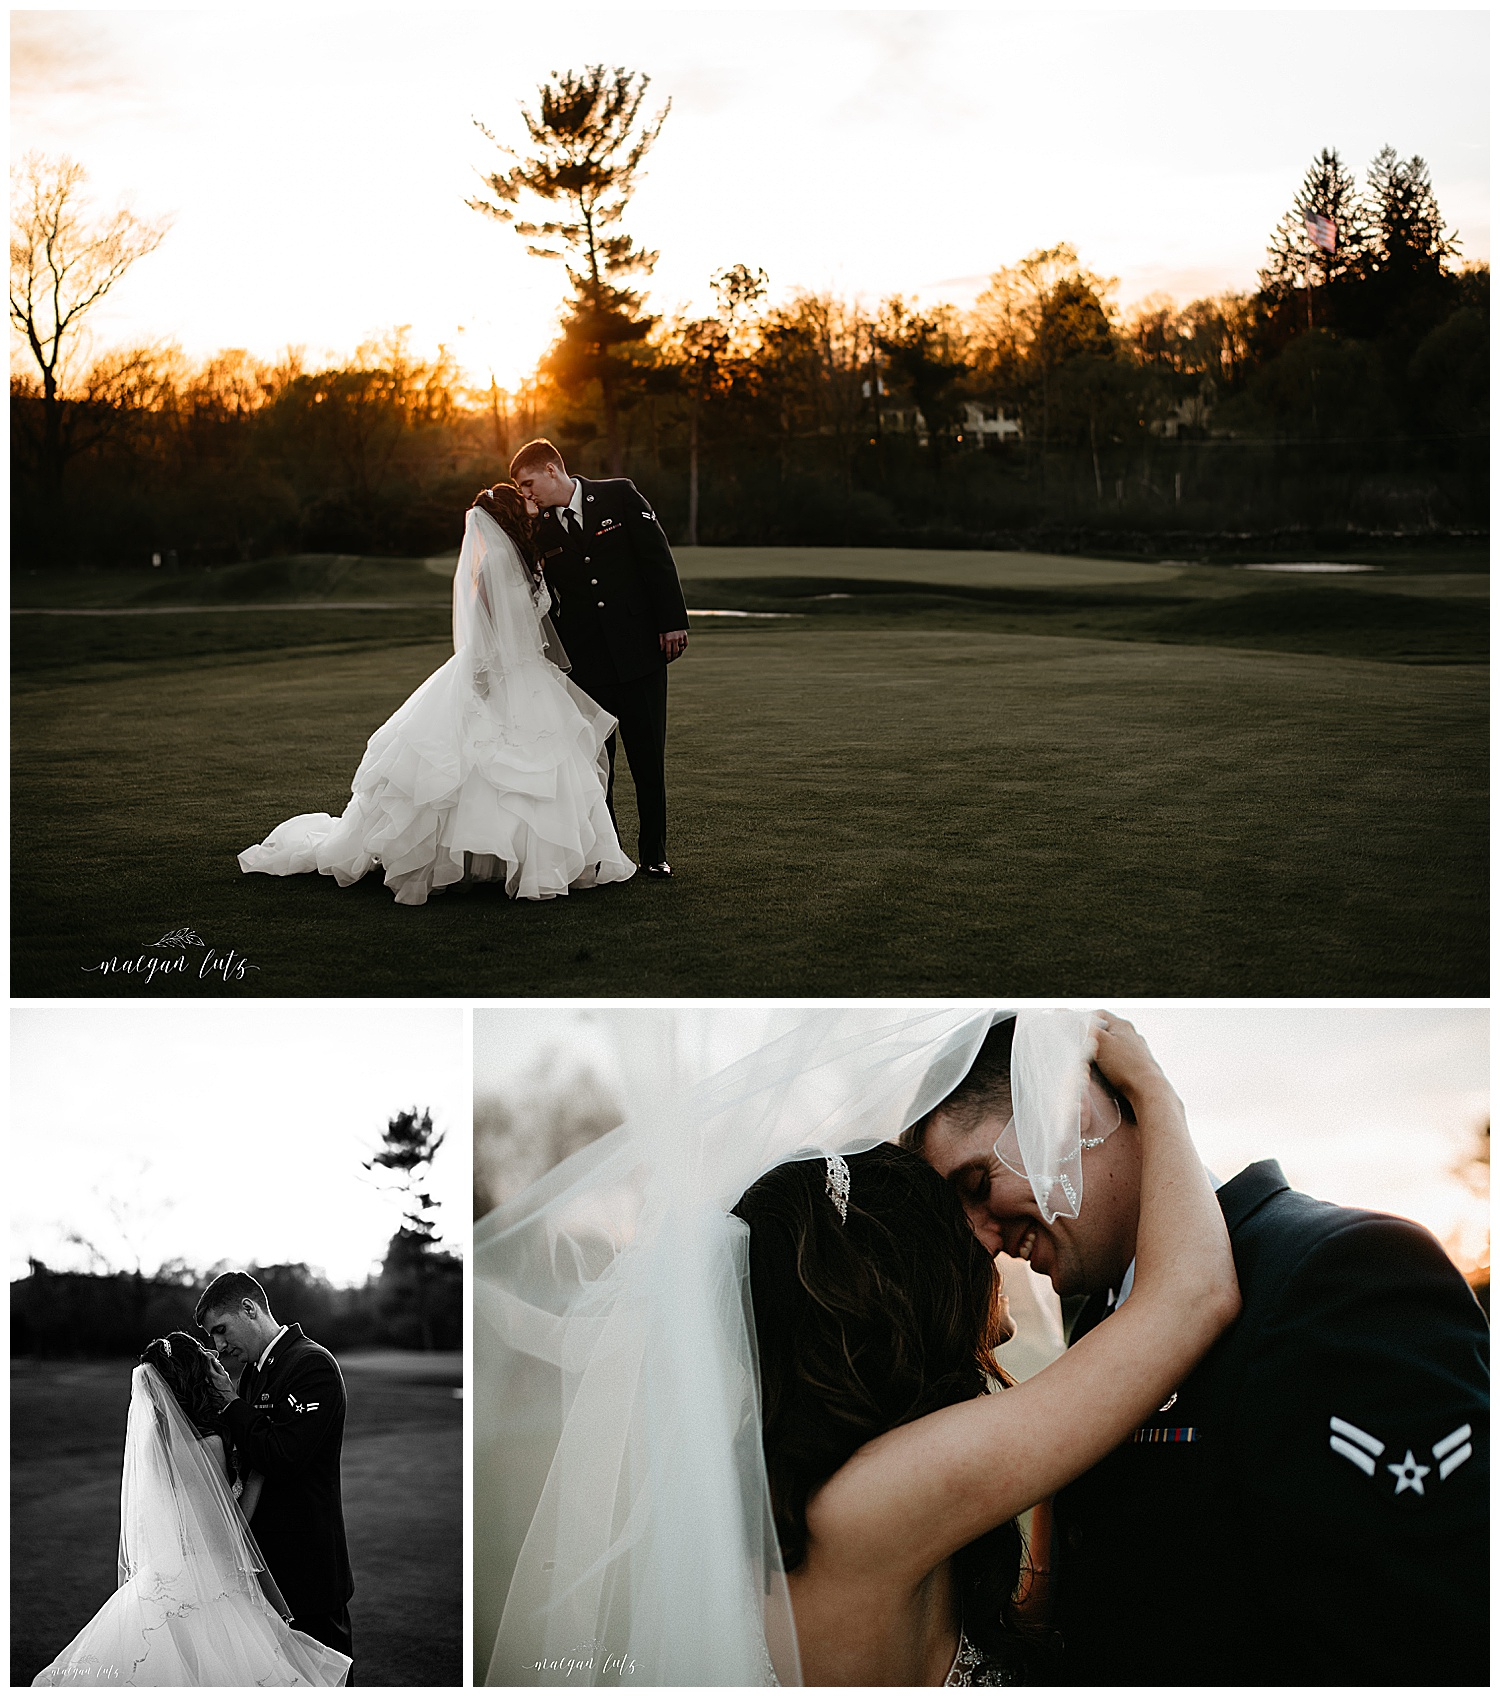 NEPA-Lehigh-Valley-Wedding-Photographer-at-Glen-Oak-Country-Club-Clarks-Summit-PA_0069.jpg